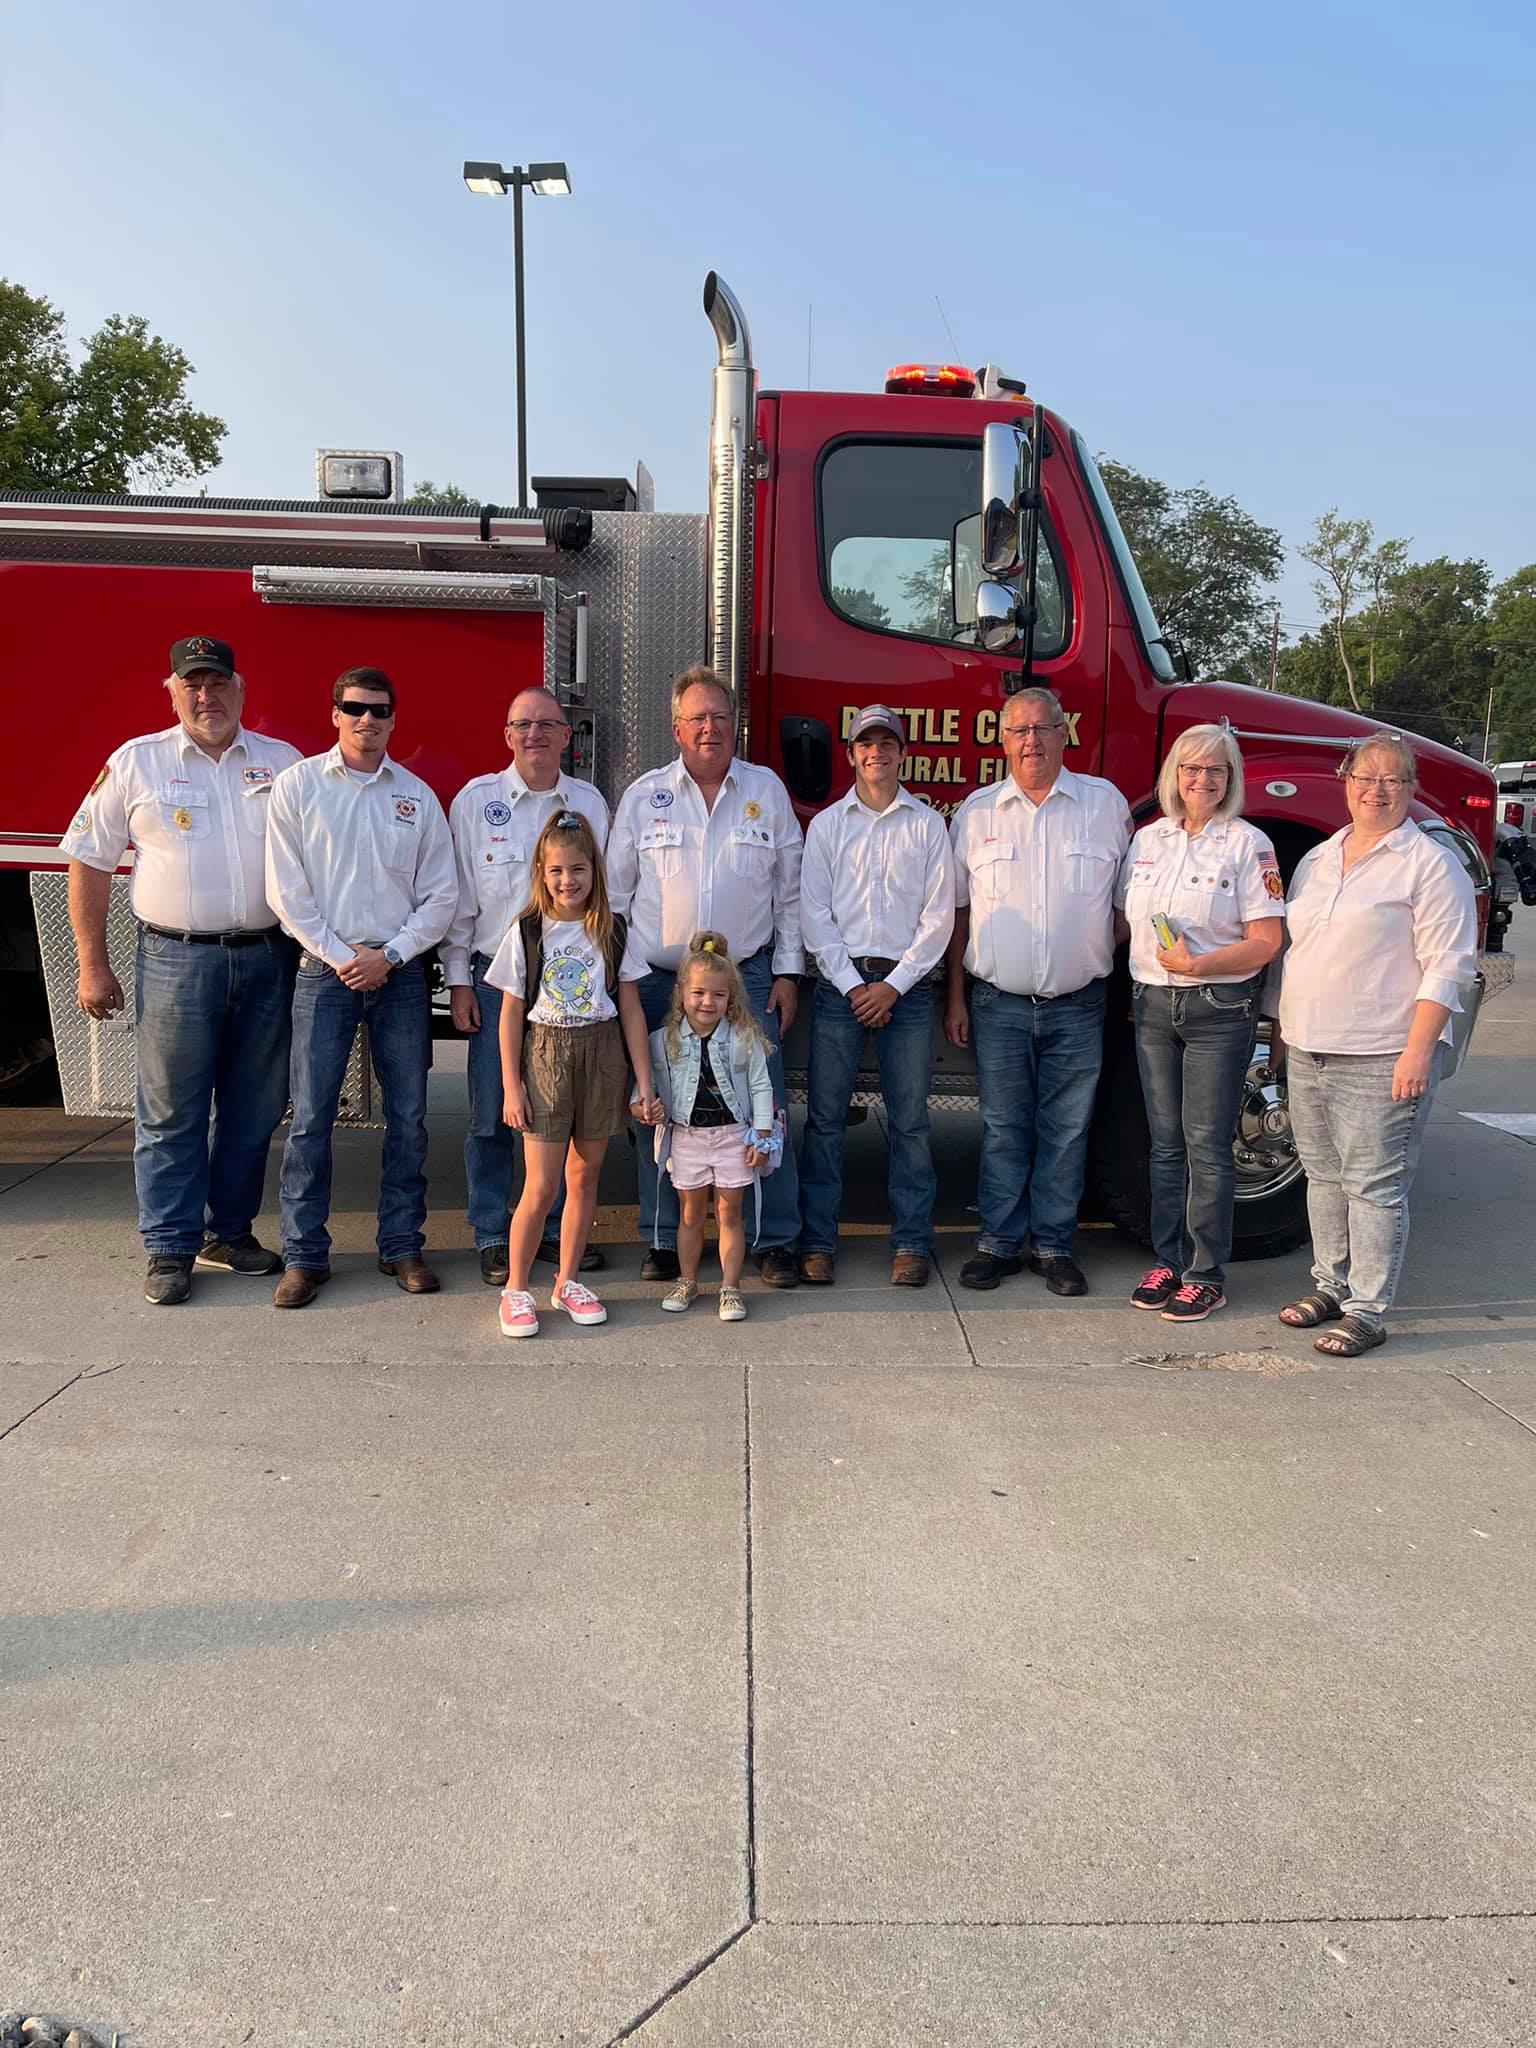 Firefighters make first day of school special, girls get fire truck escort